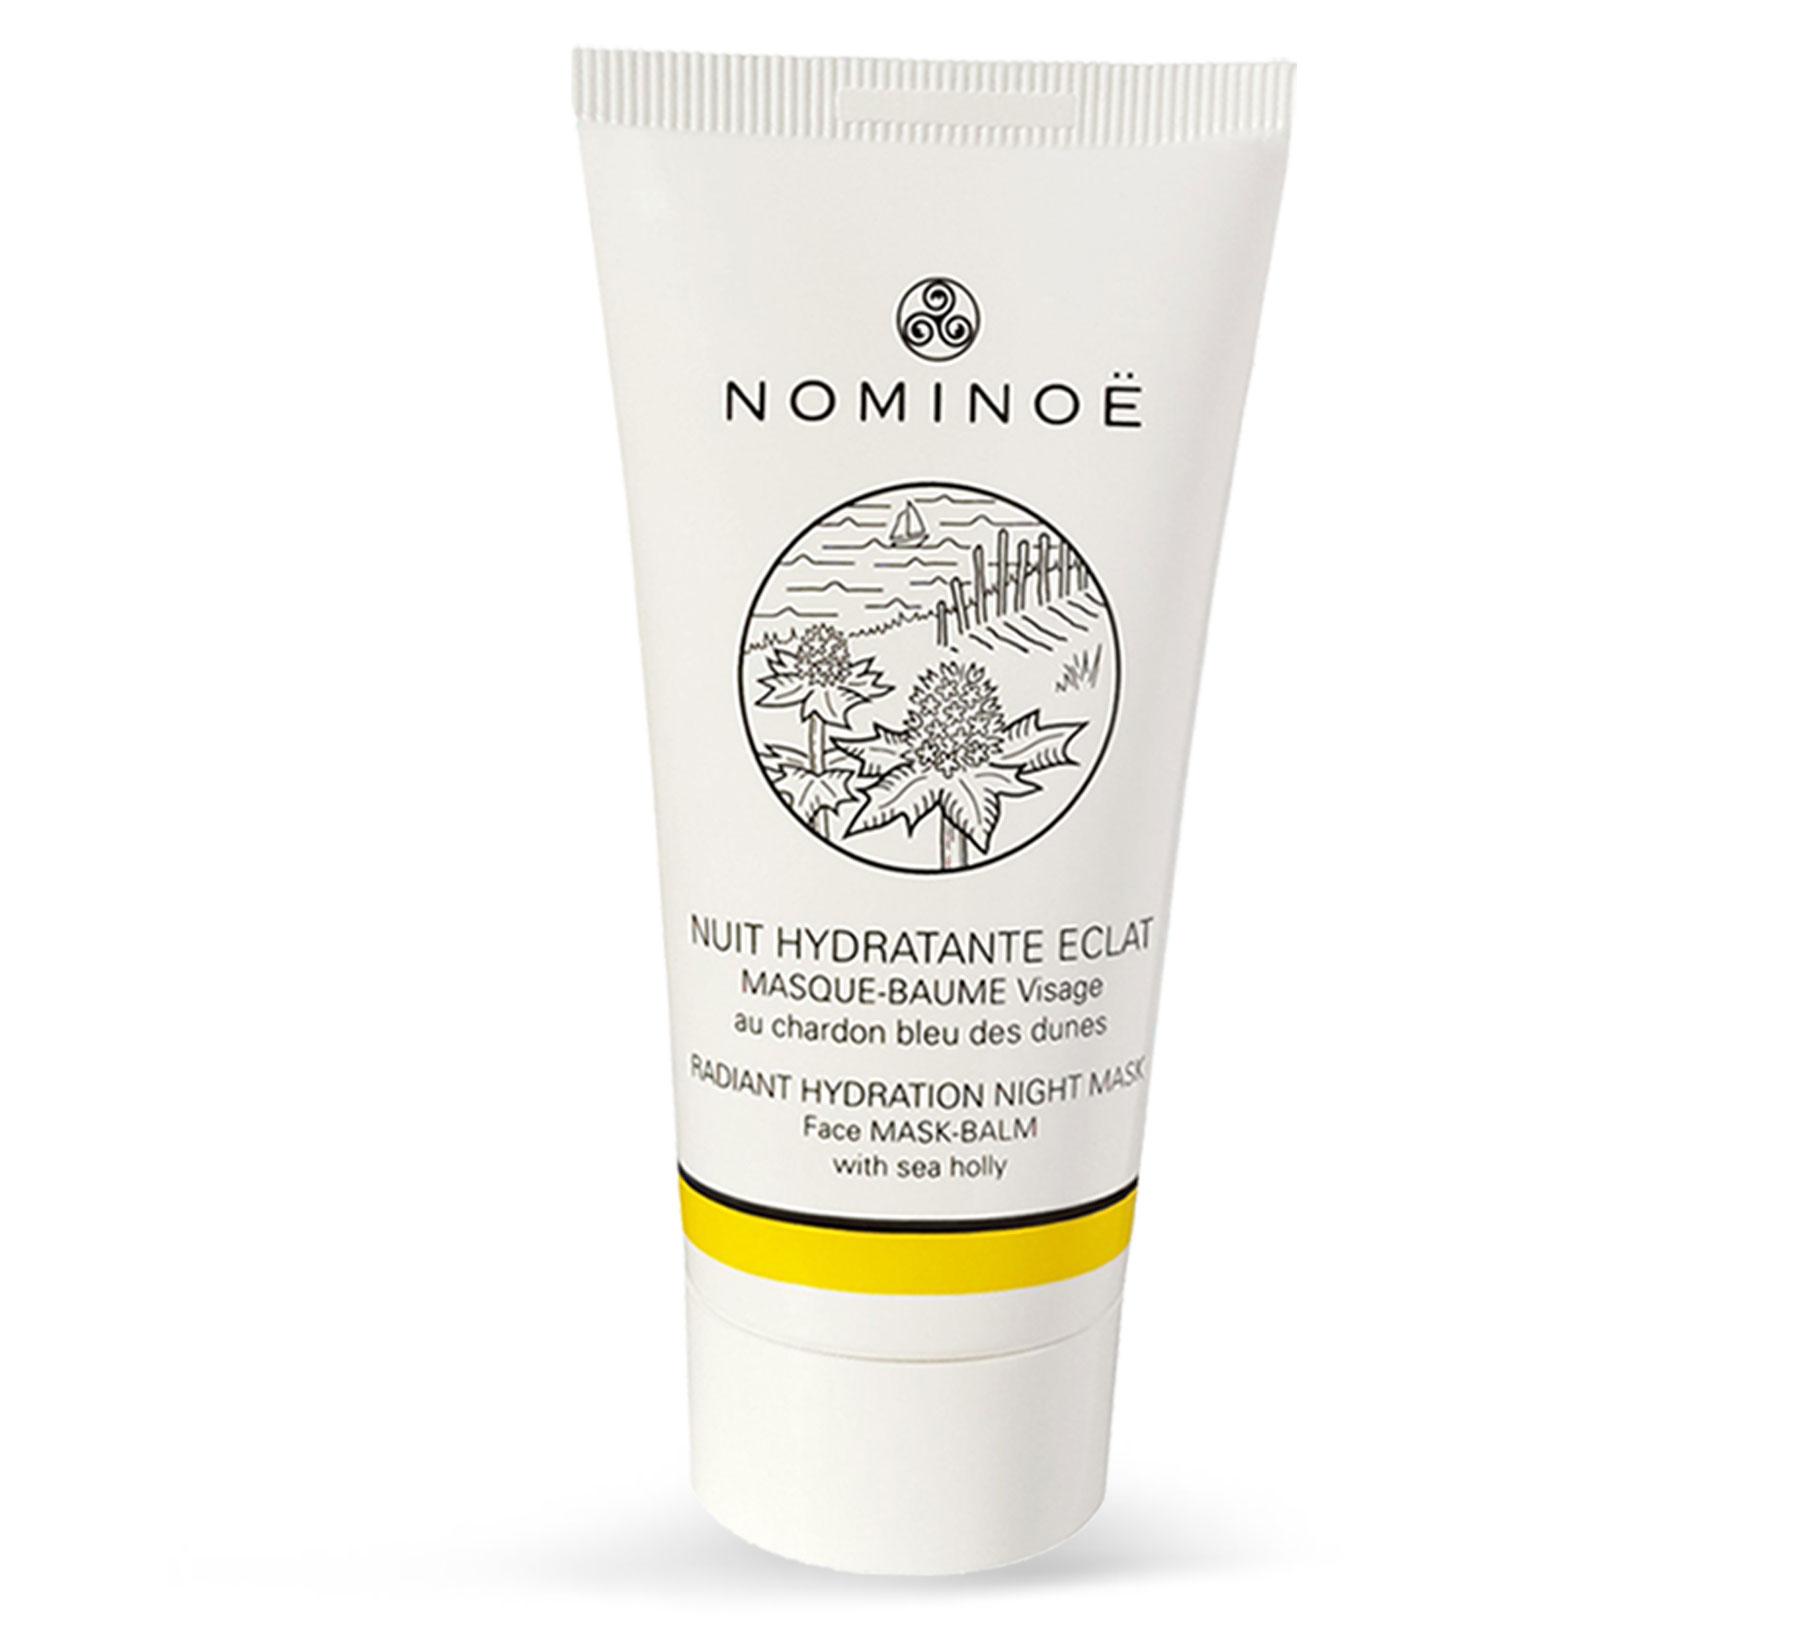 nuit-hydratante-eclat-nominoe_belle